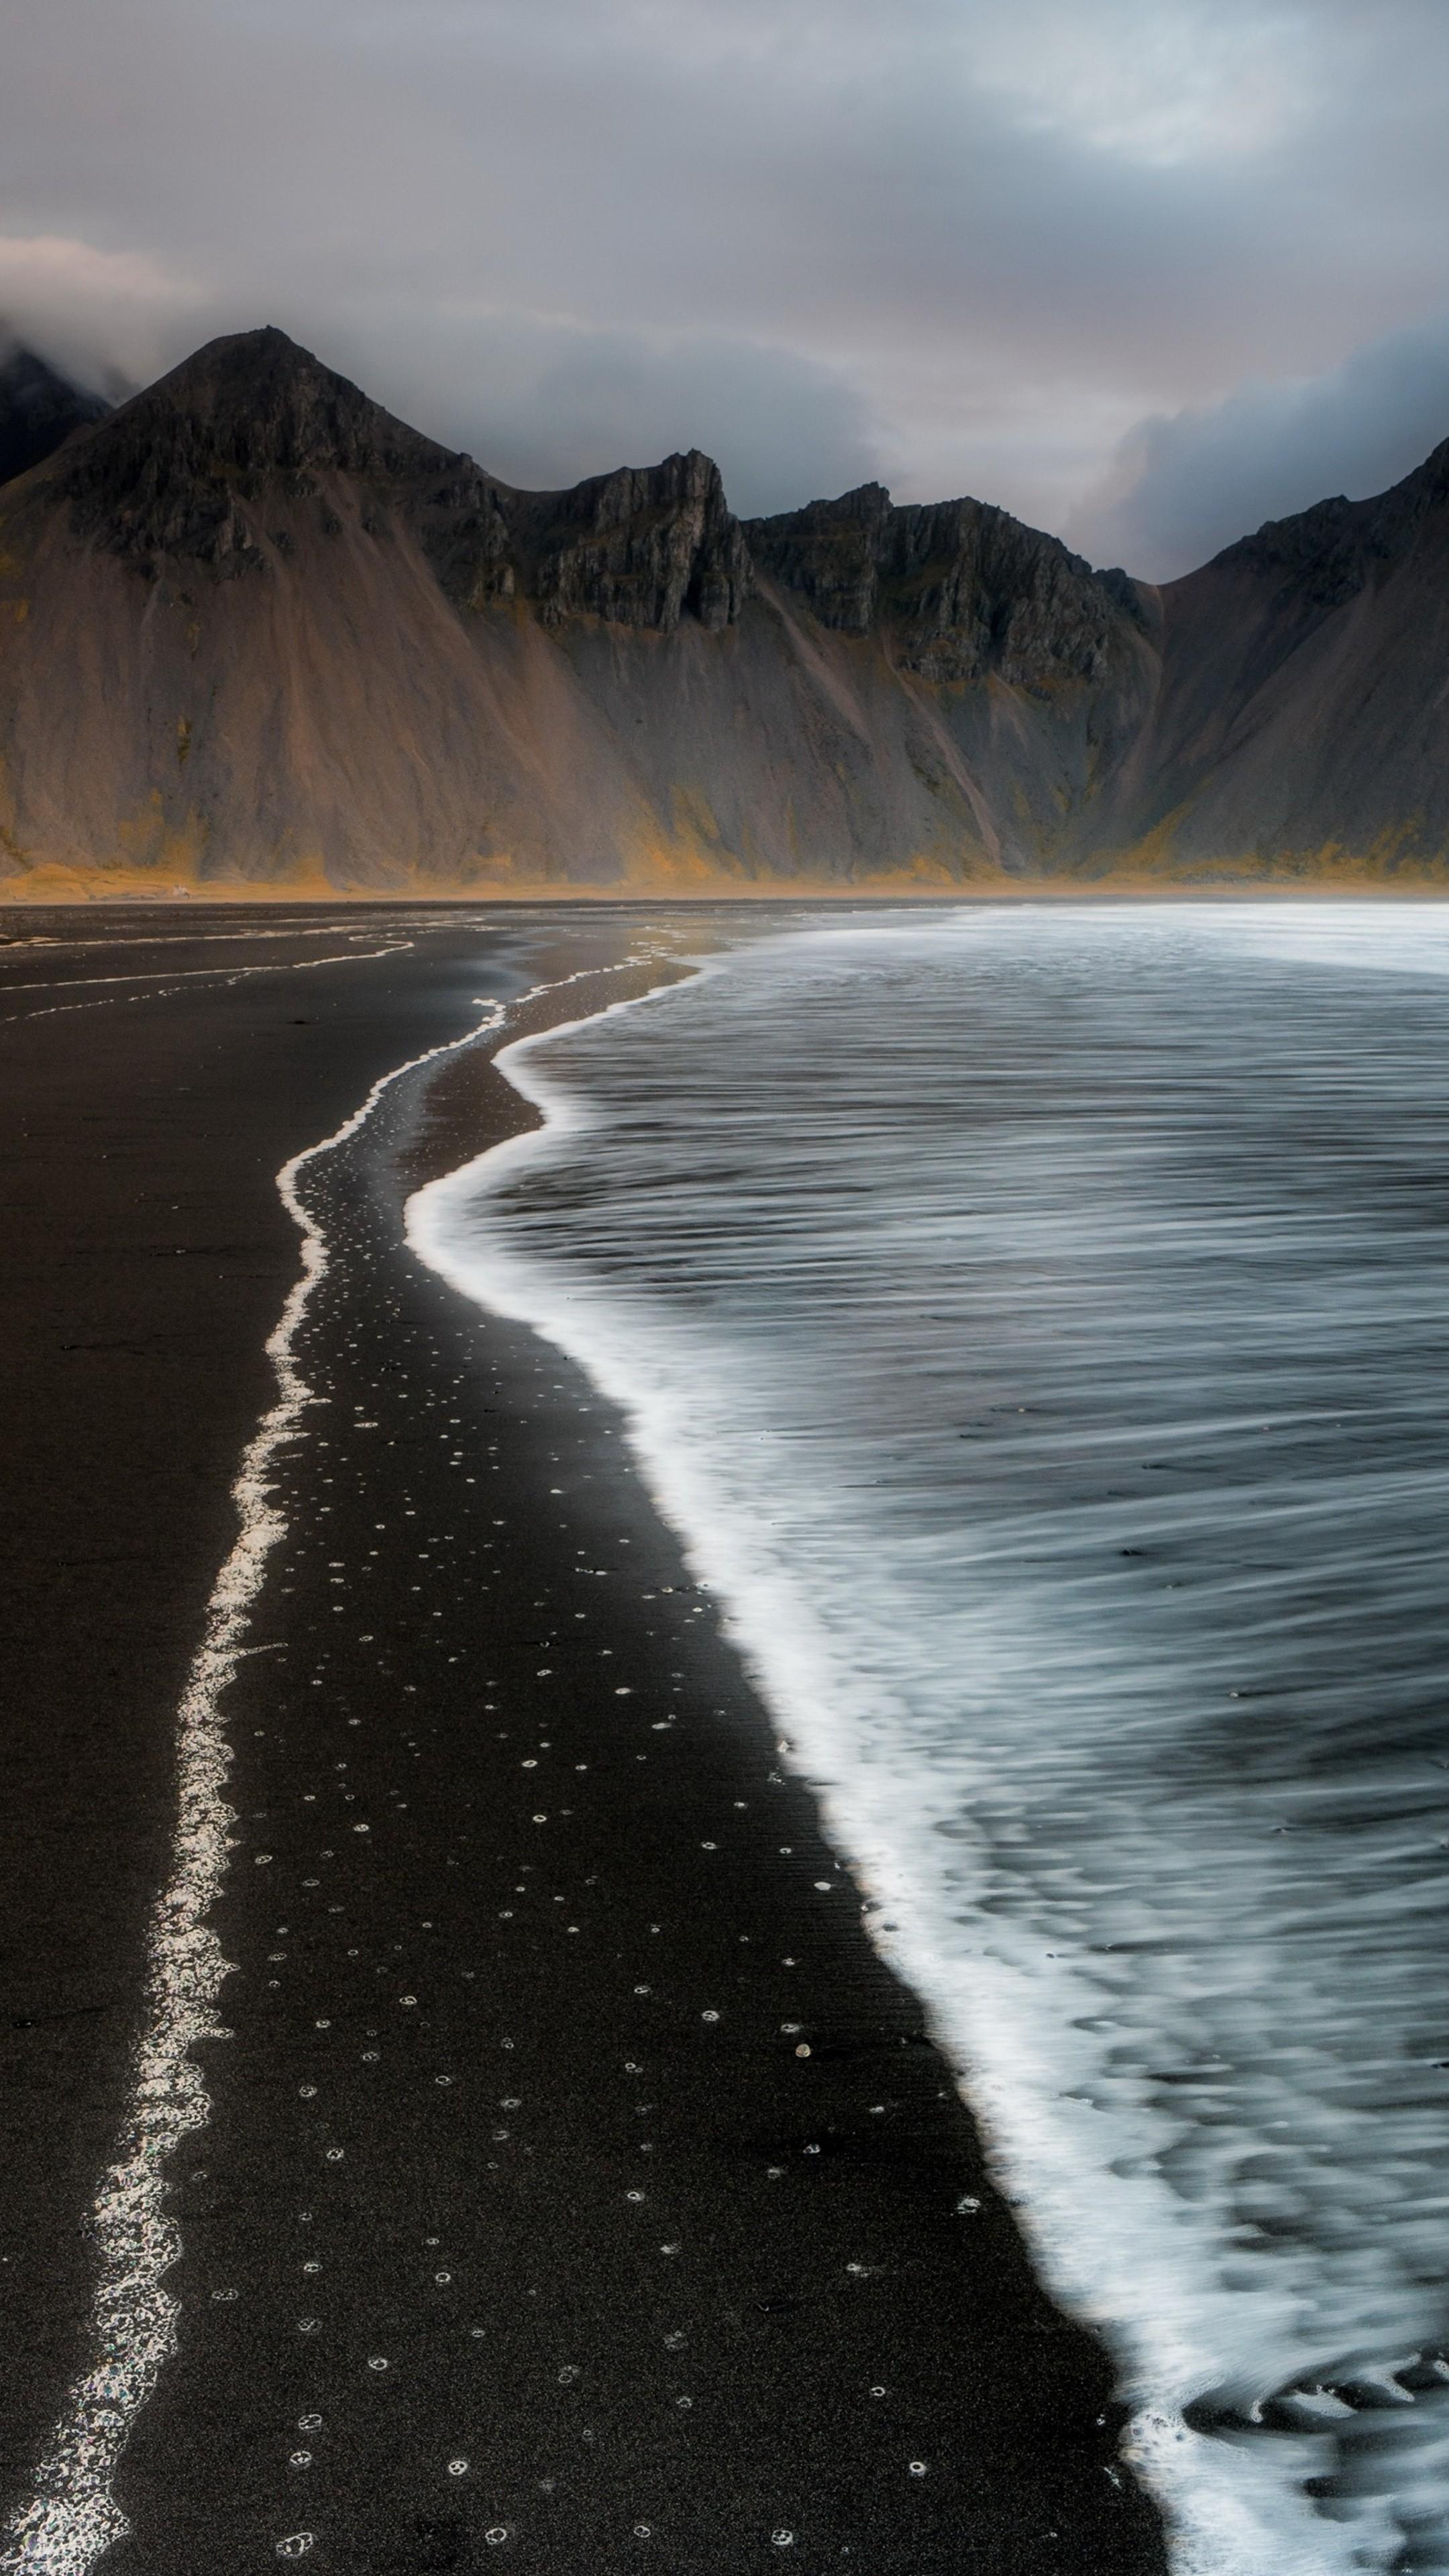 3d Hd Wallpapers For Laptop Beach Foam Iceland Mountain Nature T0 Wallpaper 2160x3840